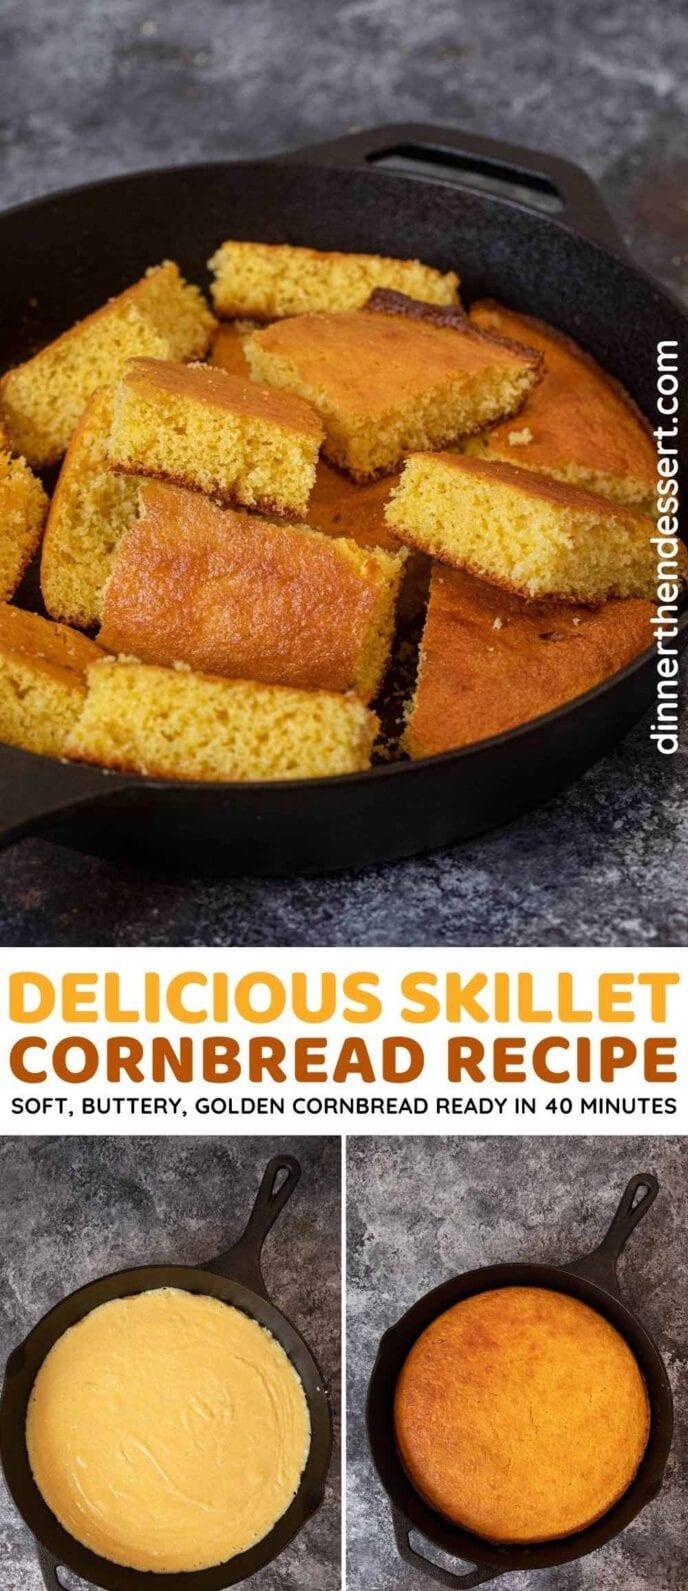 Skillet Cornbread collage